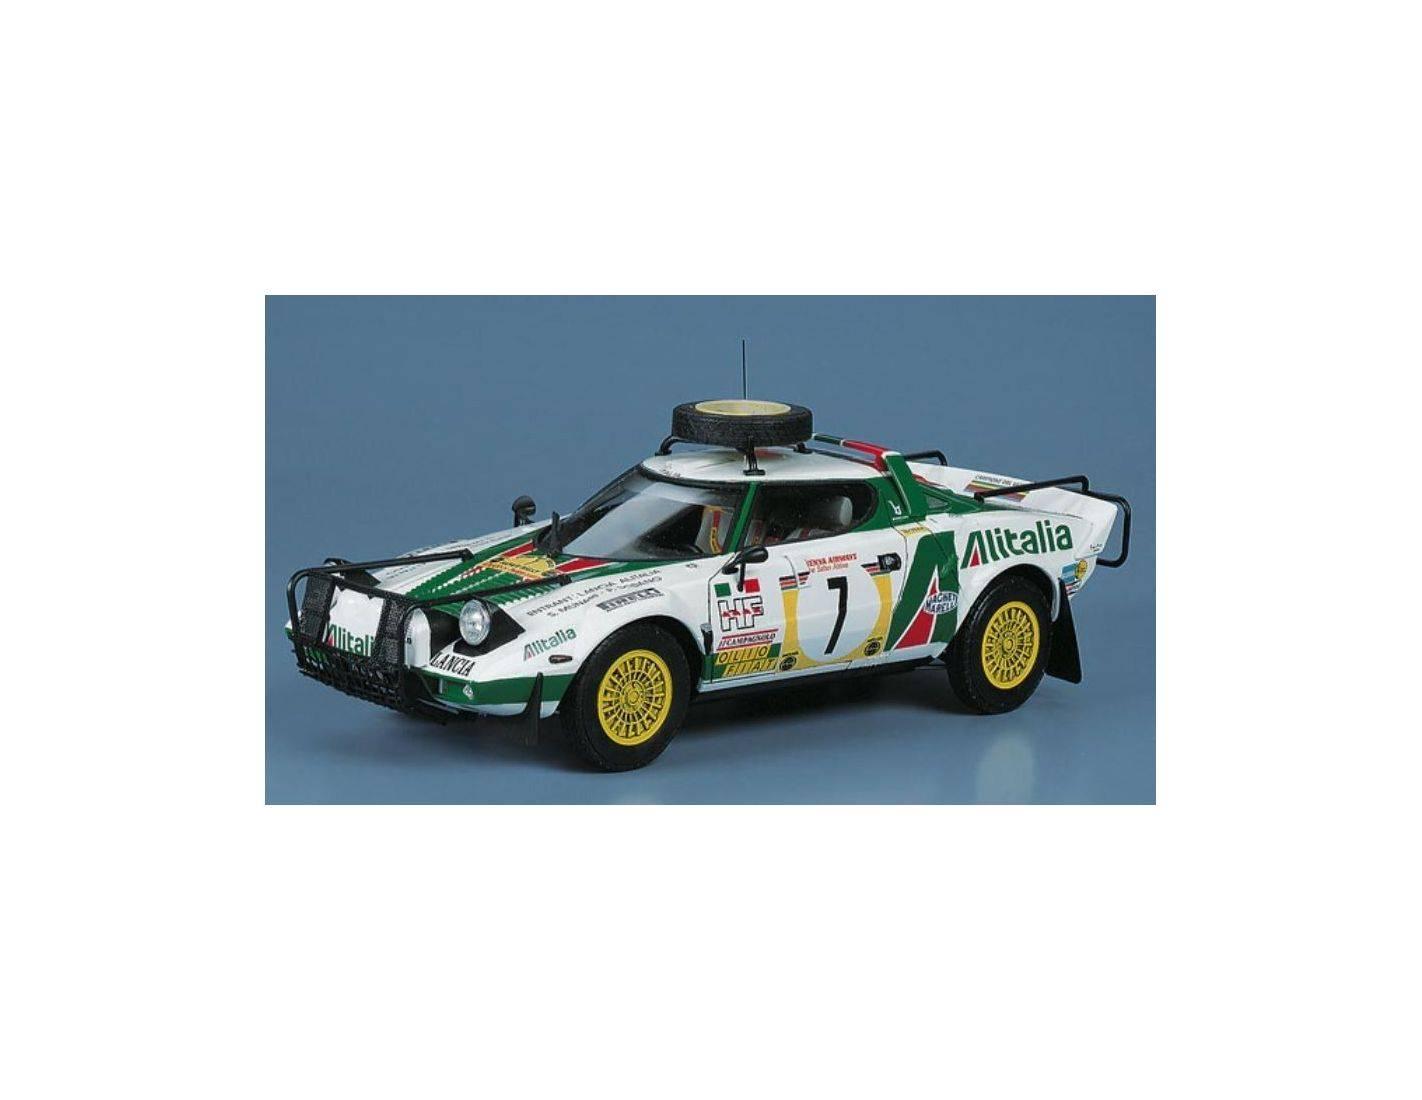 Lancia Stratos Kit Car For Sale >> Replica Lancia Stratos Rally Car Ebay | Autos Post